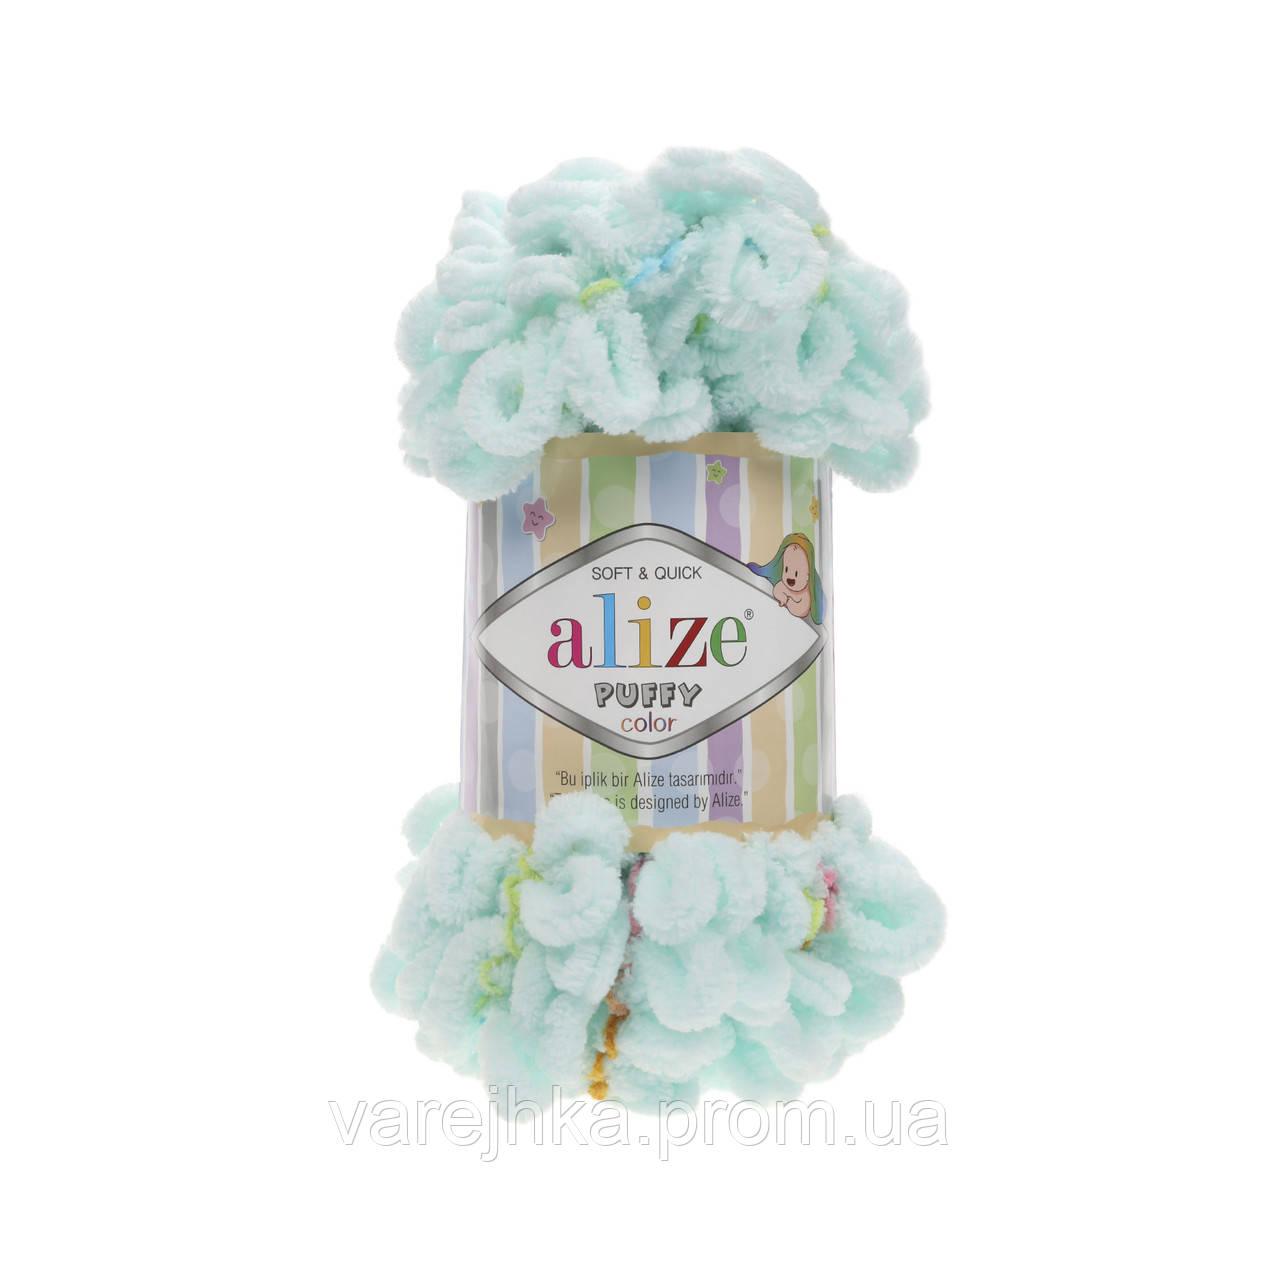 пряжа для вязания руками Alize Puffy Color 5860 ализе пуфи колор